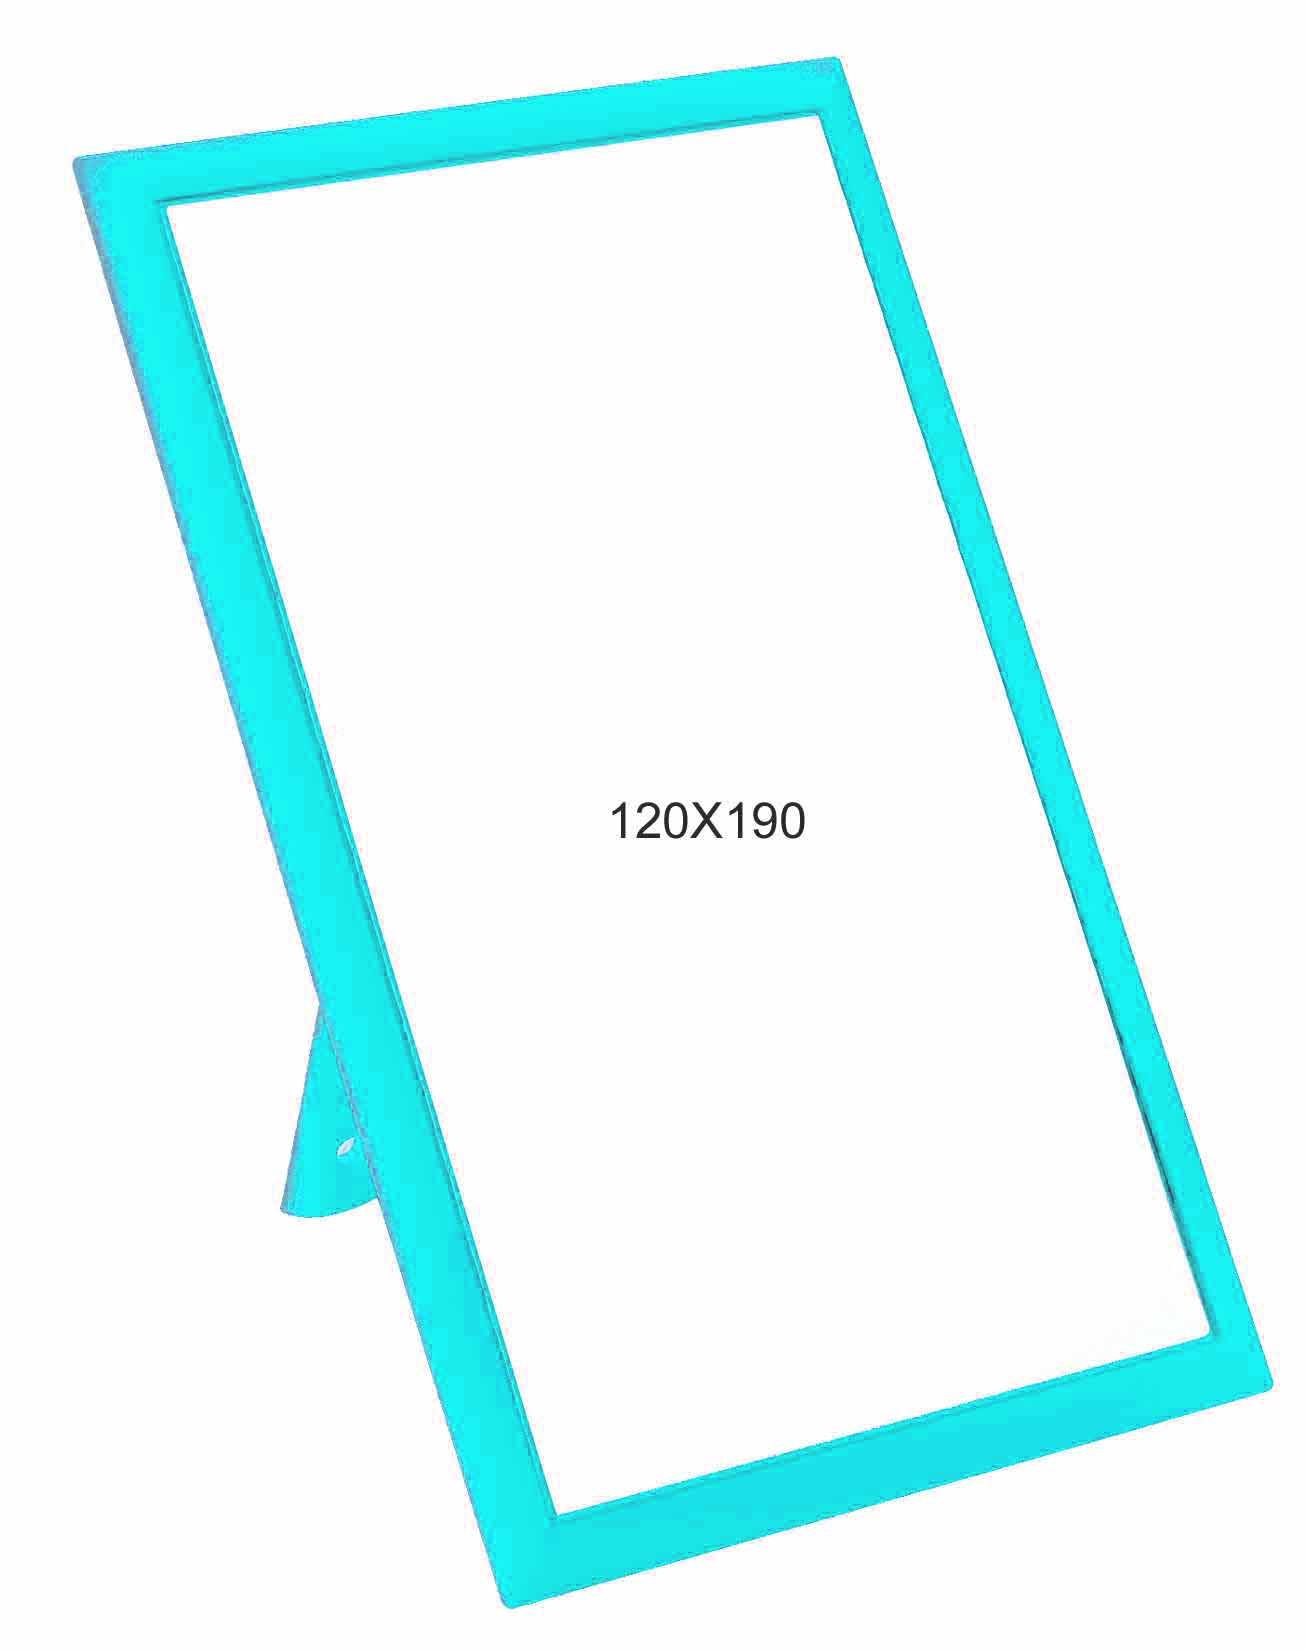 Зеркало настольное 120190 Код 82477-TSE